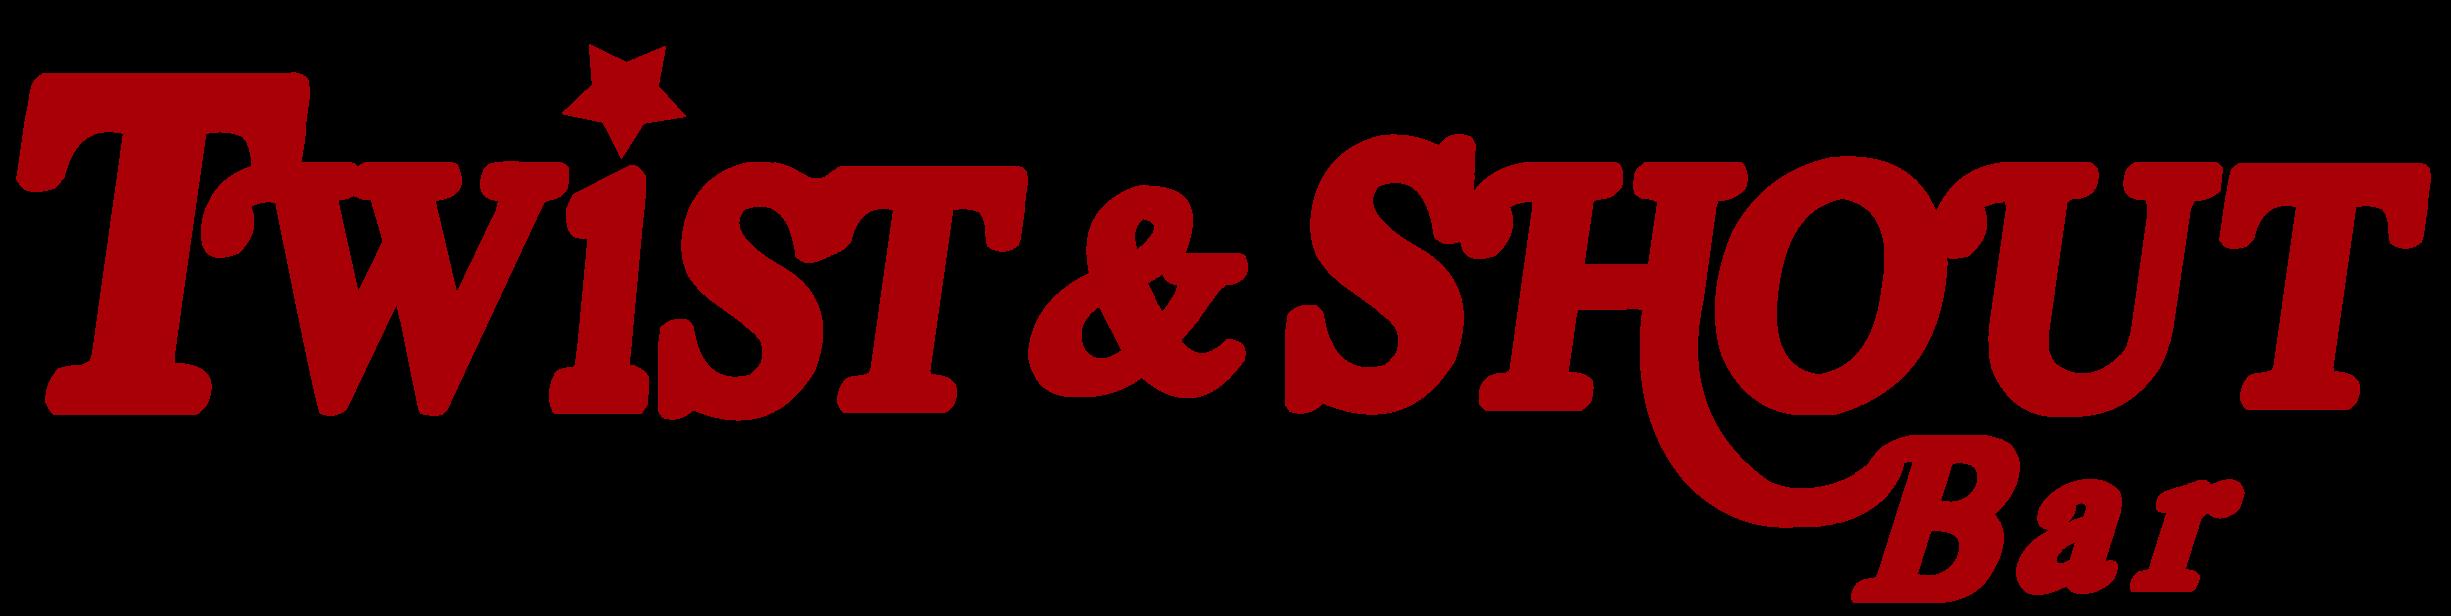 Twist & Shout Bar